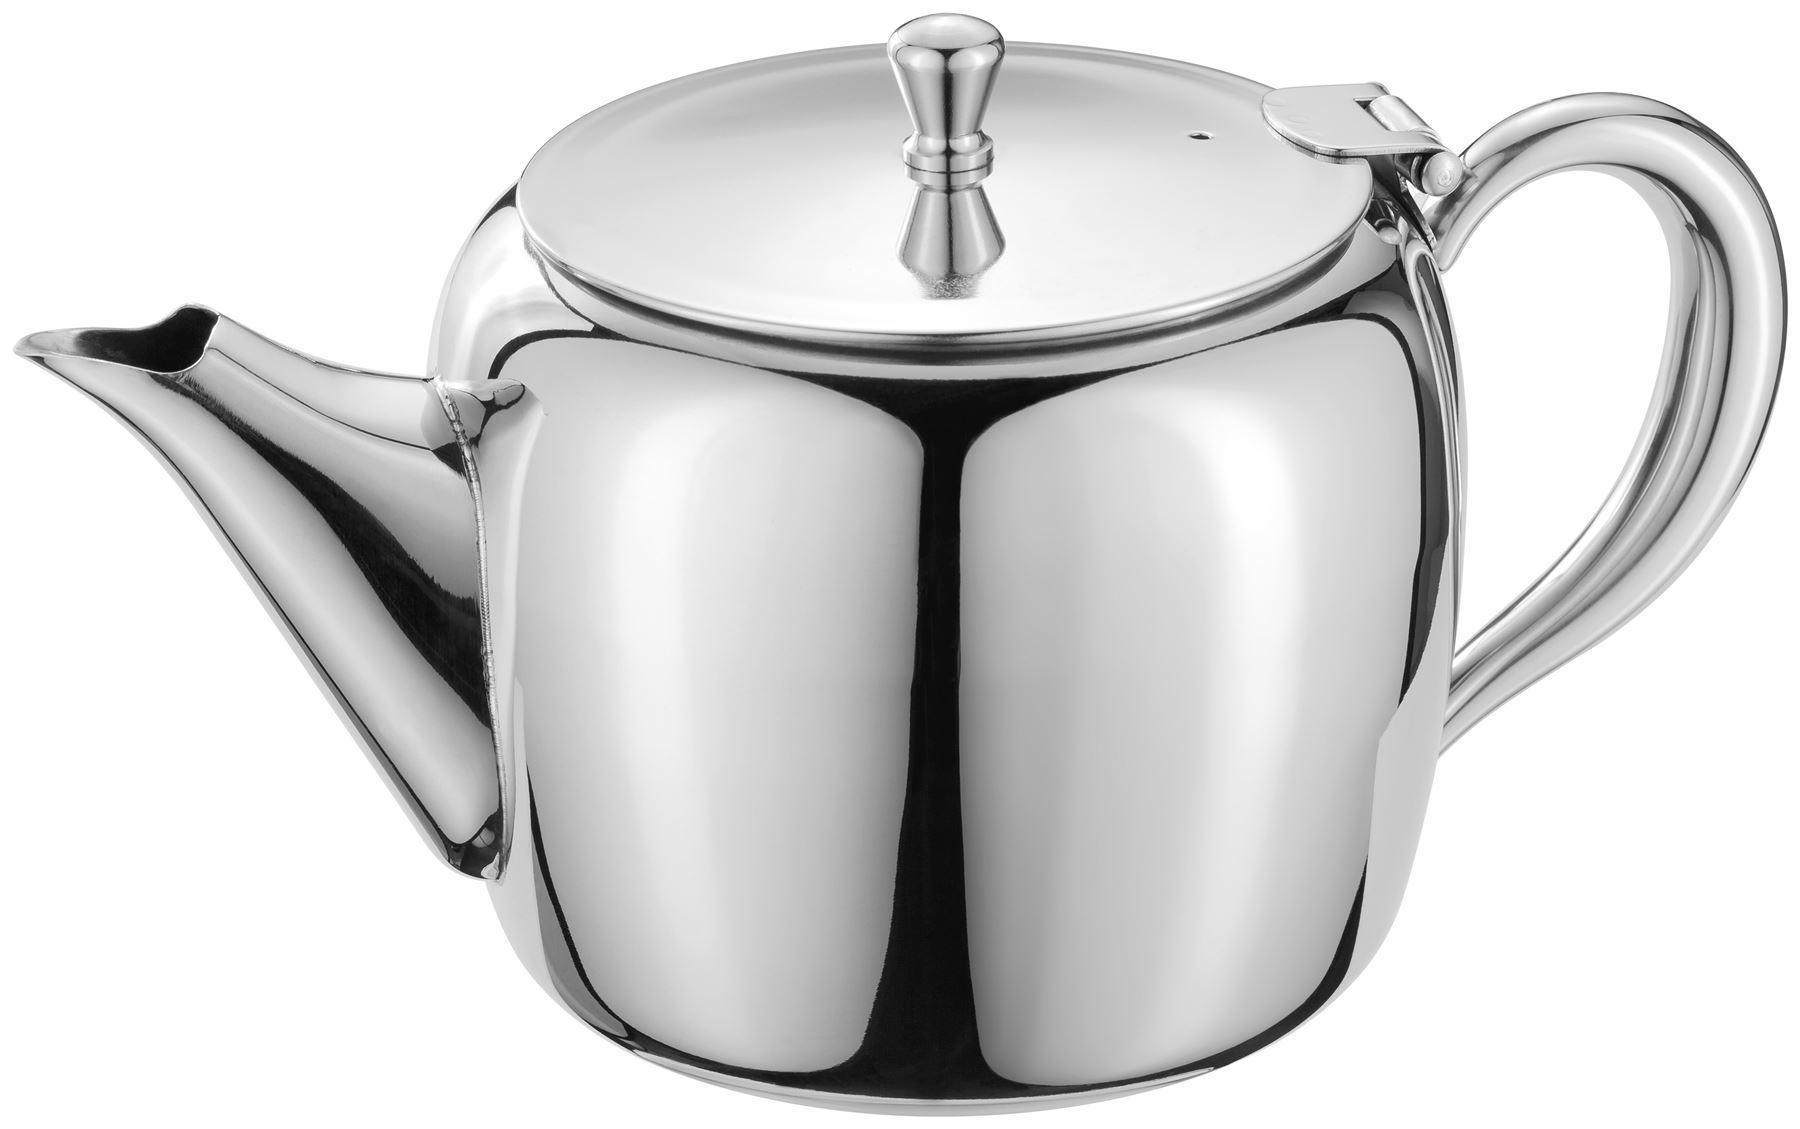 judge teaware stainless steel teapots tea pots tall or short   - judgeteawarestainlesssteelteapotsteapotstall